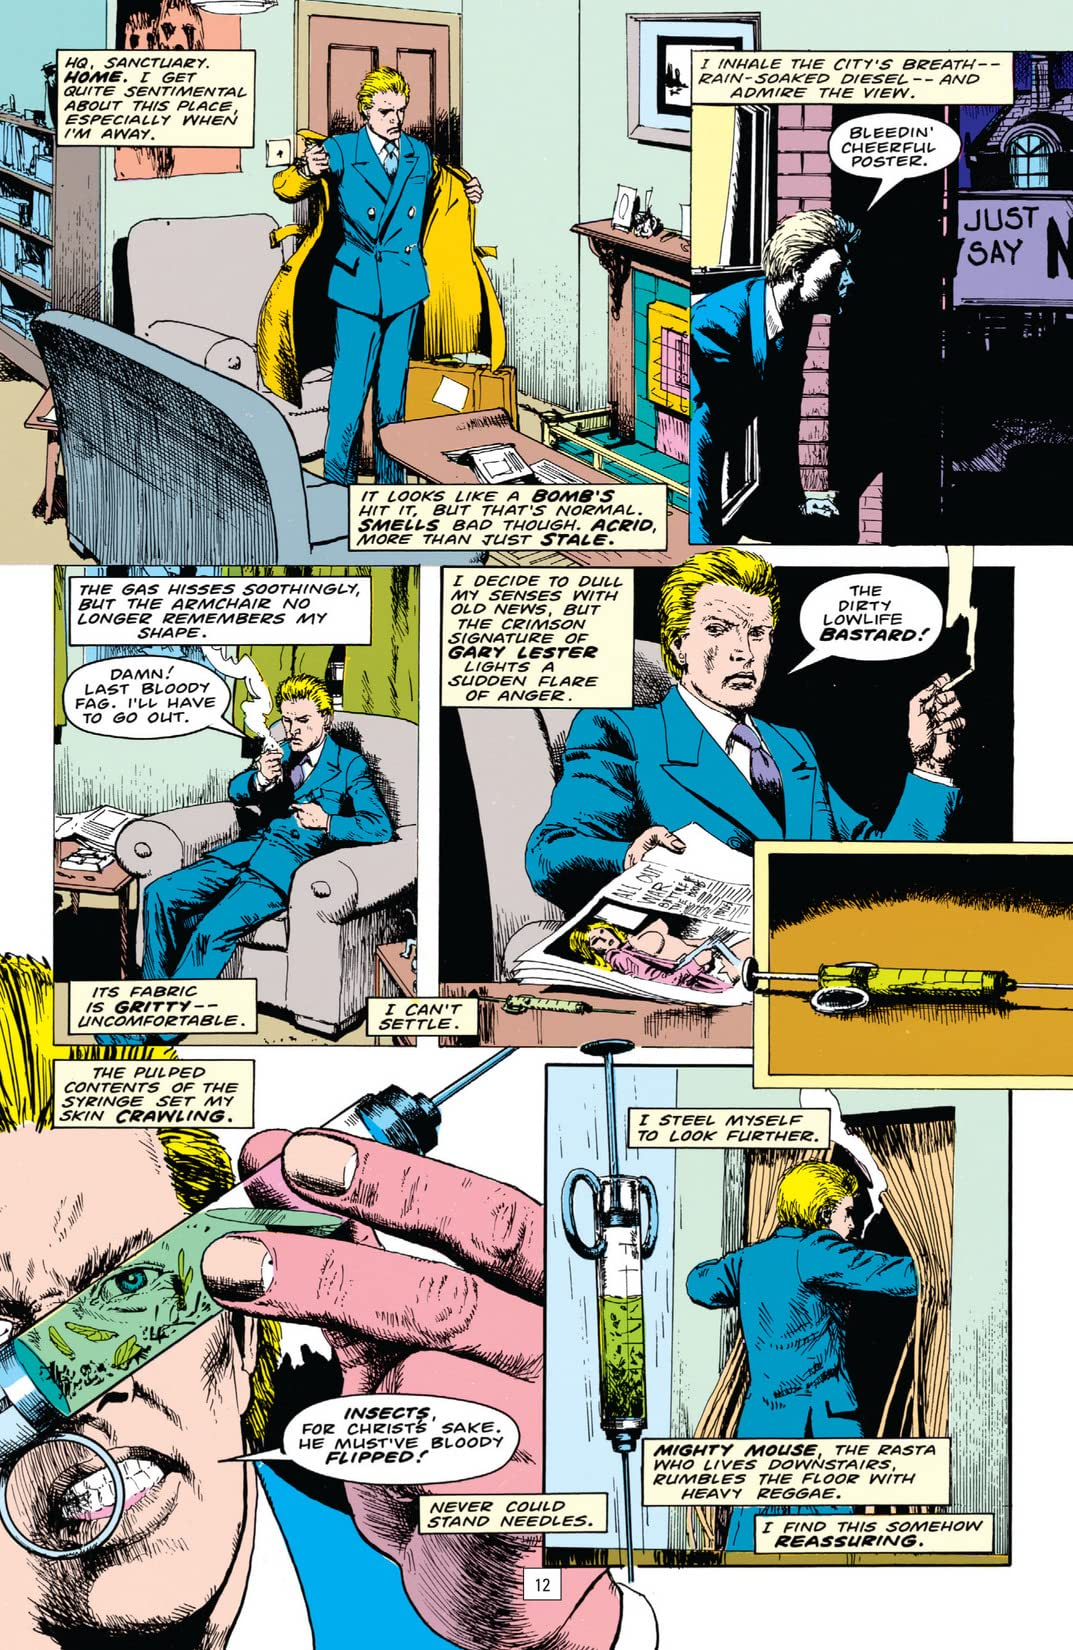 John Constantine, Hellblazer Vol. 1: Original Sins